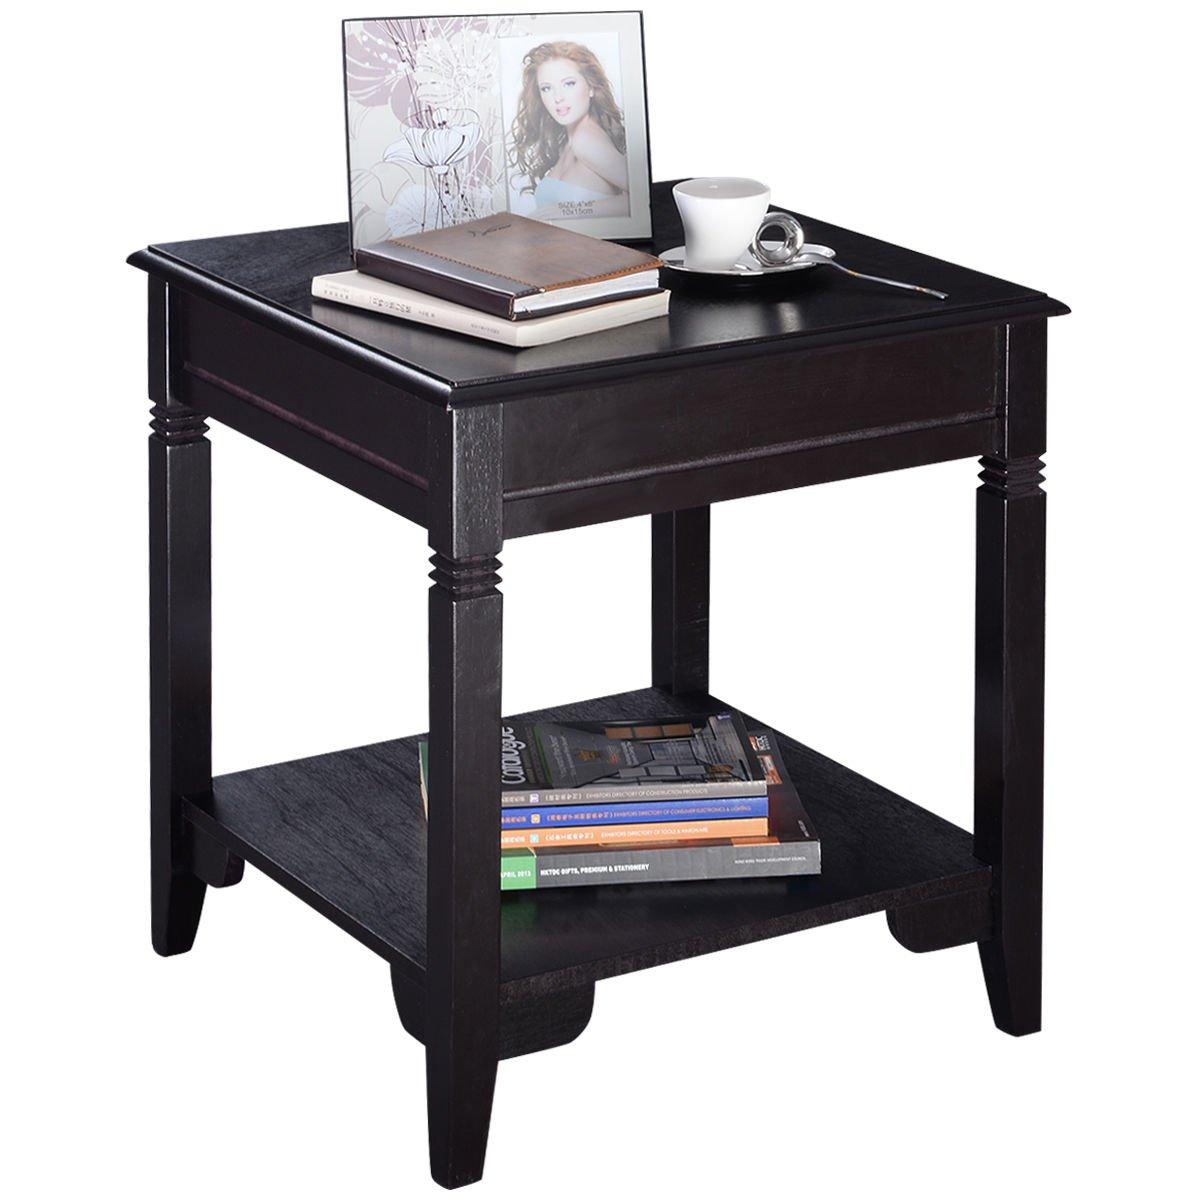 Furinho Bush - Nolan End Table Durable Quality Furniture Shelf Decor Home Living Room New YRS 1114 by Furinho Bush